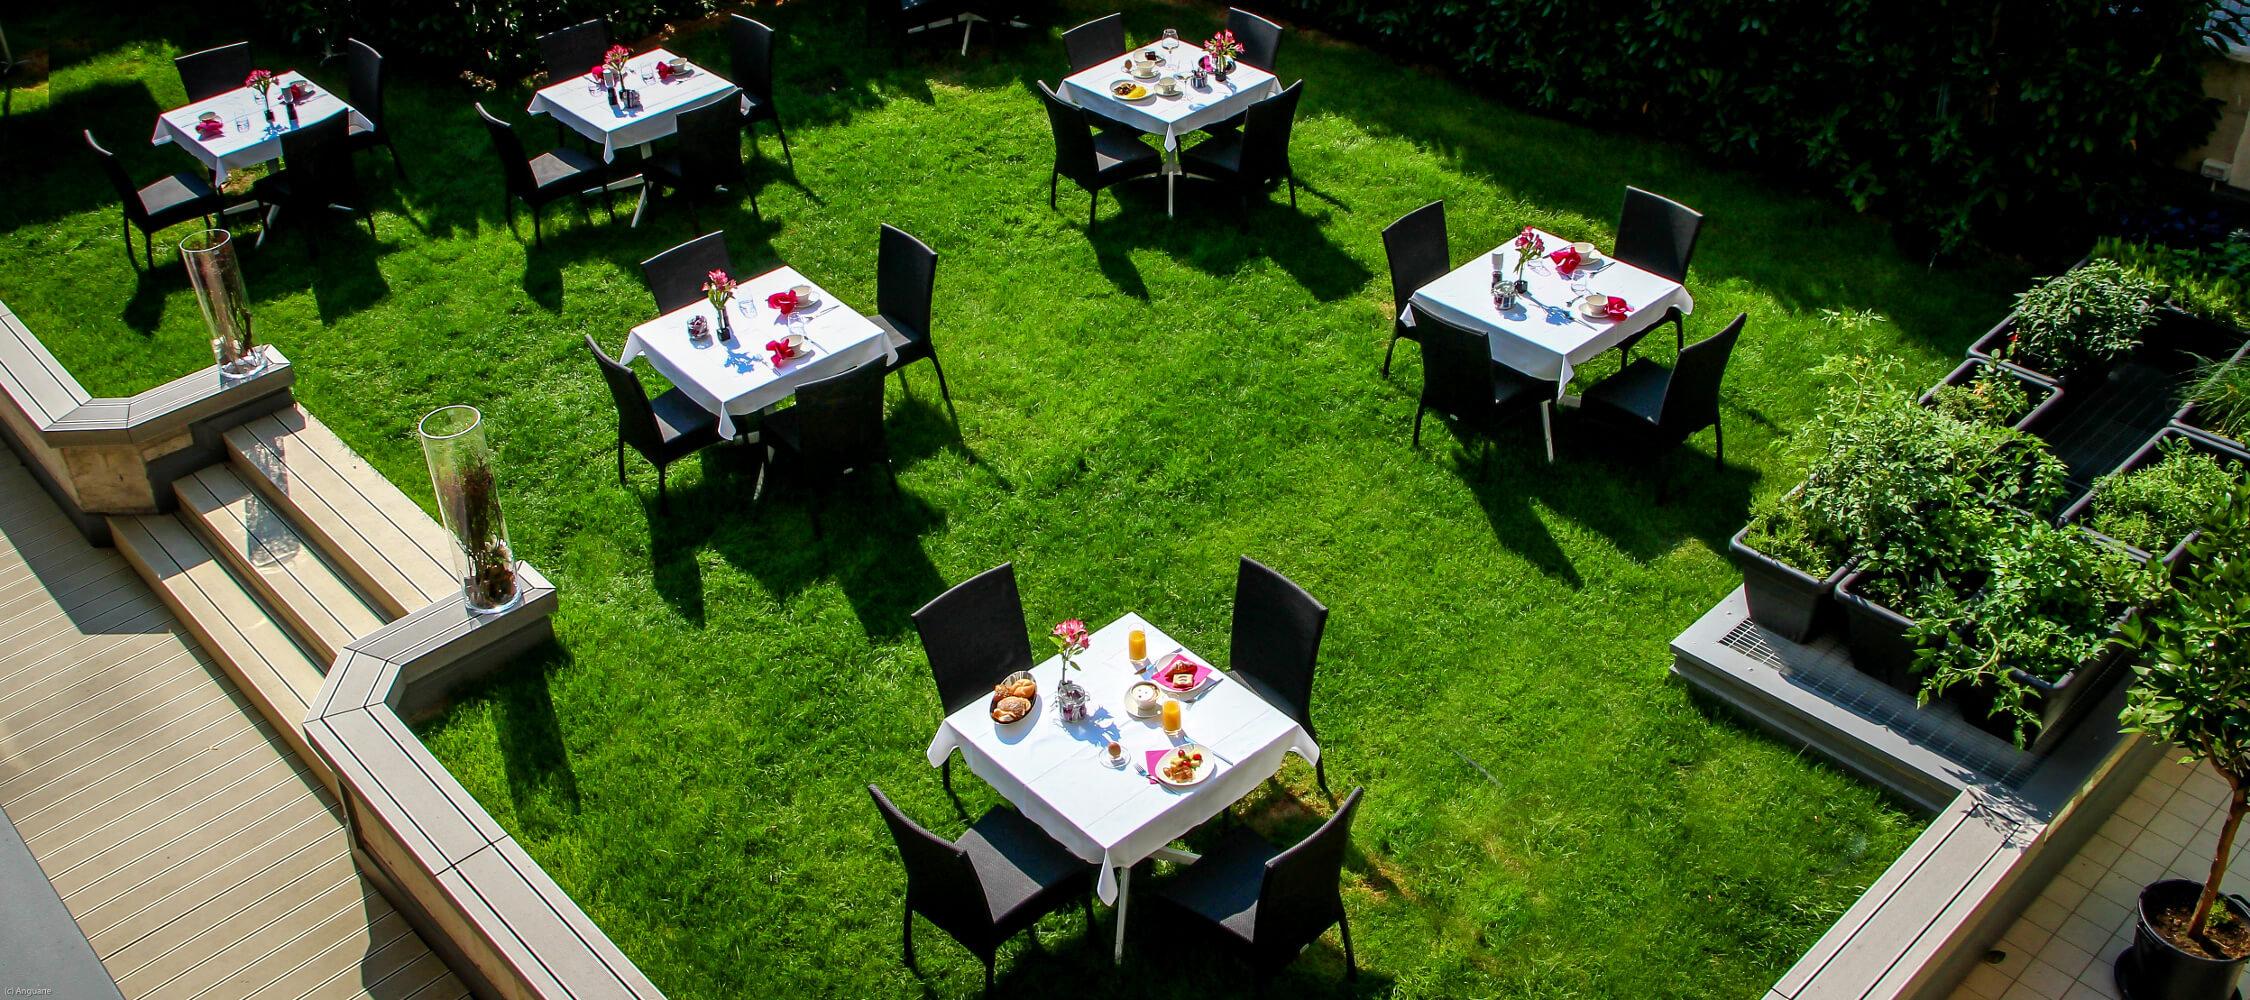 City_Hotel_Merano_Restaurant_Breakfast_Buffet_Fruehstueck_Terrasse_Anguane_2001_2250x1000